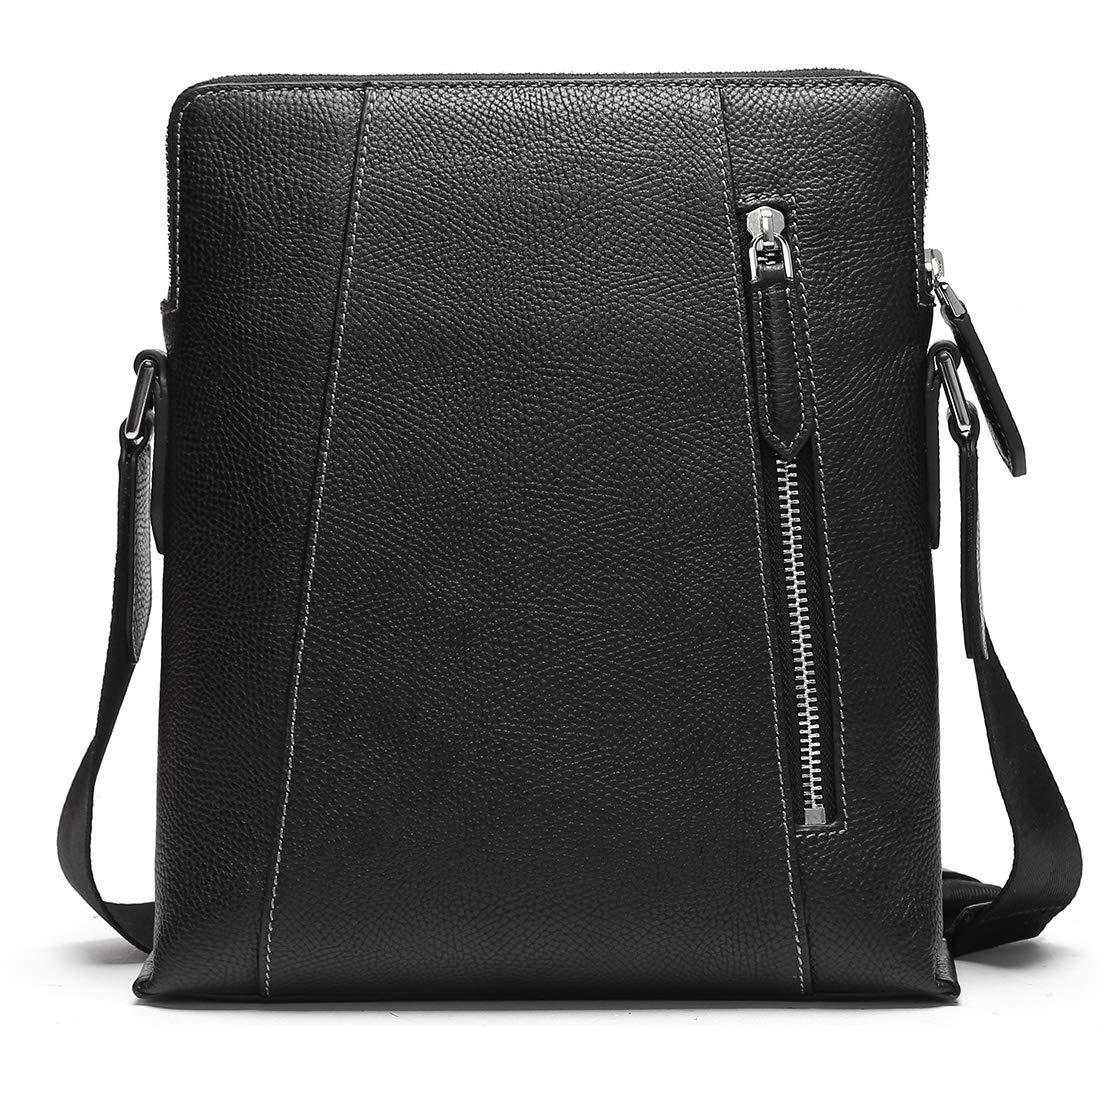 fdc6fcc68027 Amazon.com  BABAMA Men Shoulder Bag Crossbody Purse Genuine Leather  Messenger Bags Briefcase Black-1  Clothing